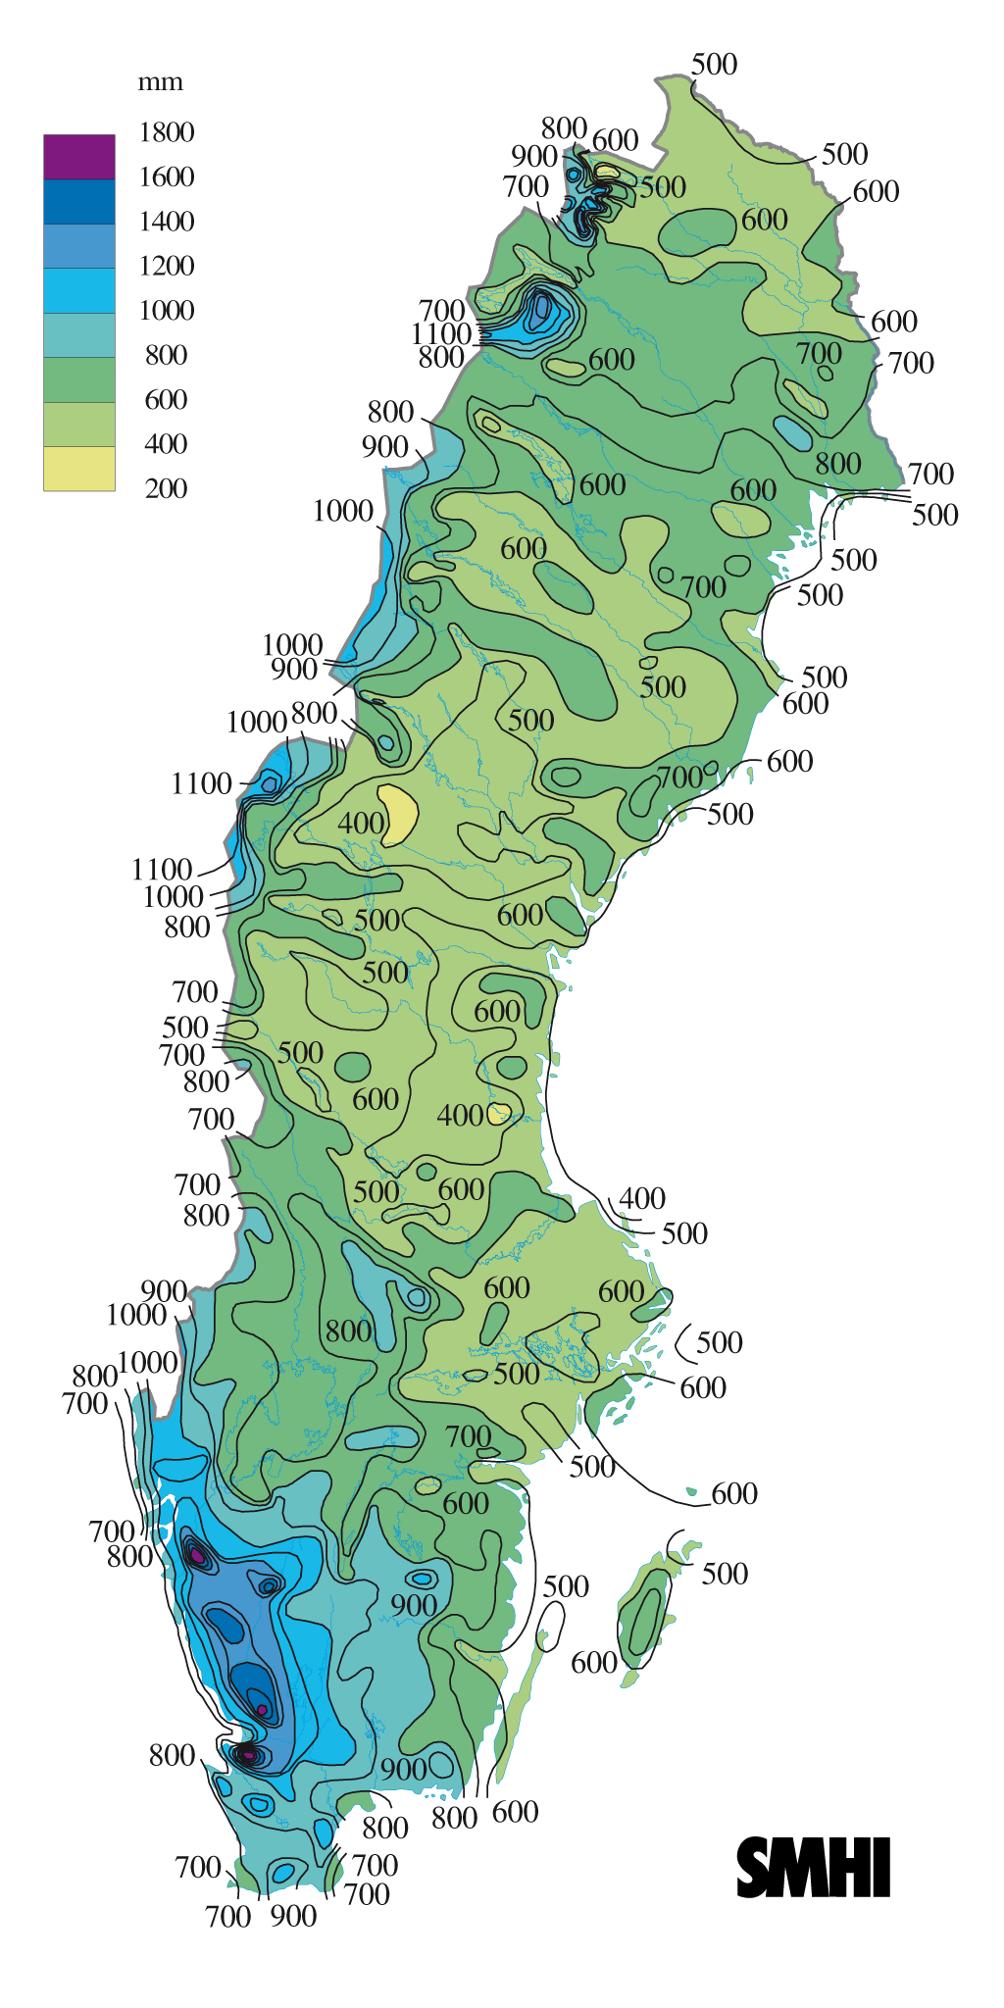 karta satellit sverige SMHI   Månads , årstids  och årskartor | SMHI karta satellit sverige